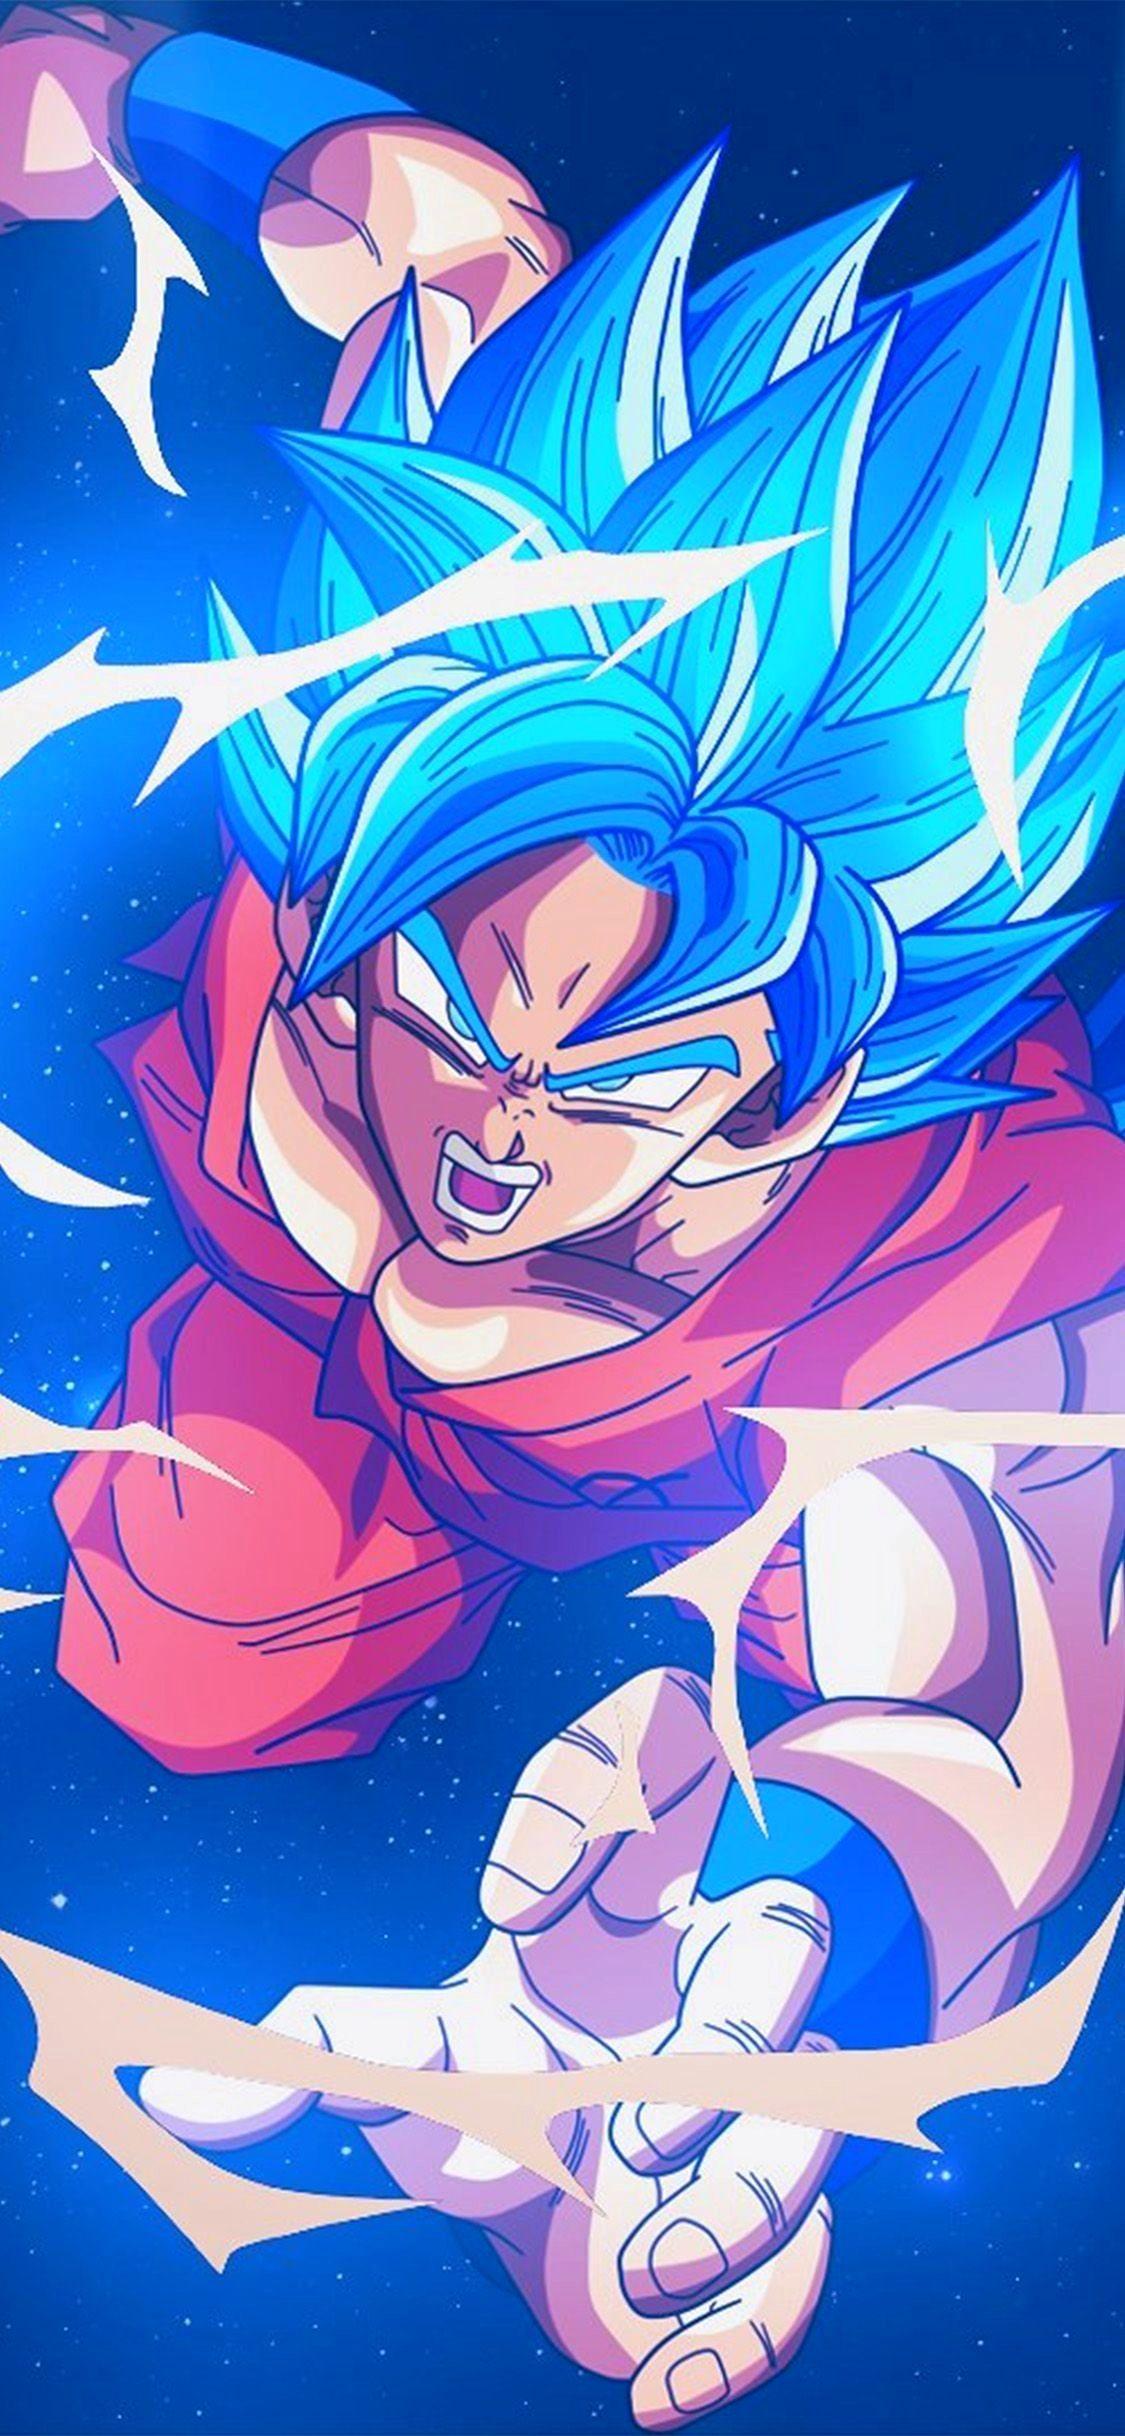 Goku Ultra Instinct Wallpaper 4k Iphone Gallery Di 2020 Wallpaper Iphone